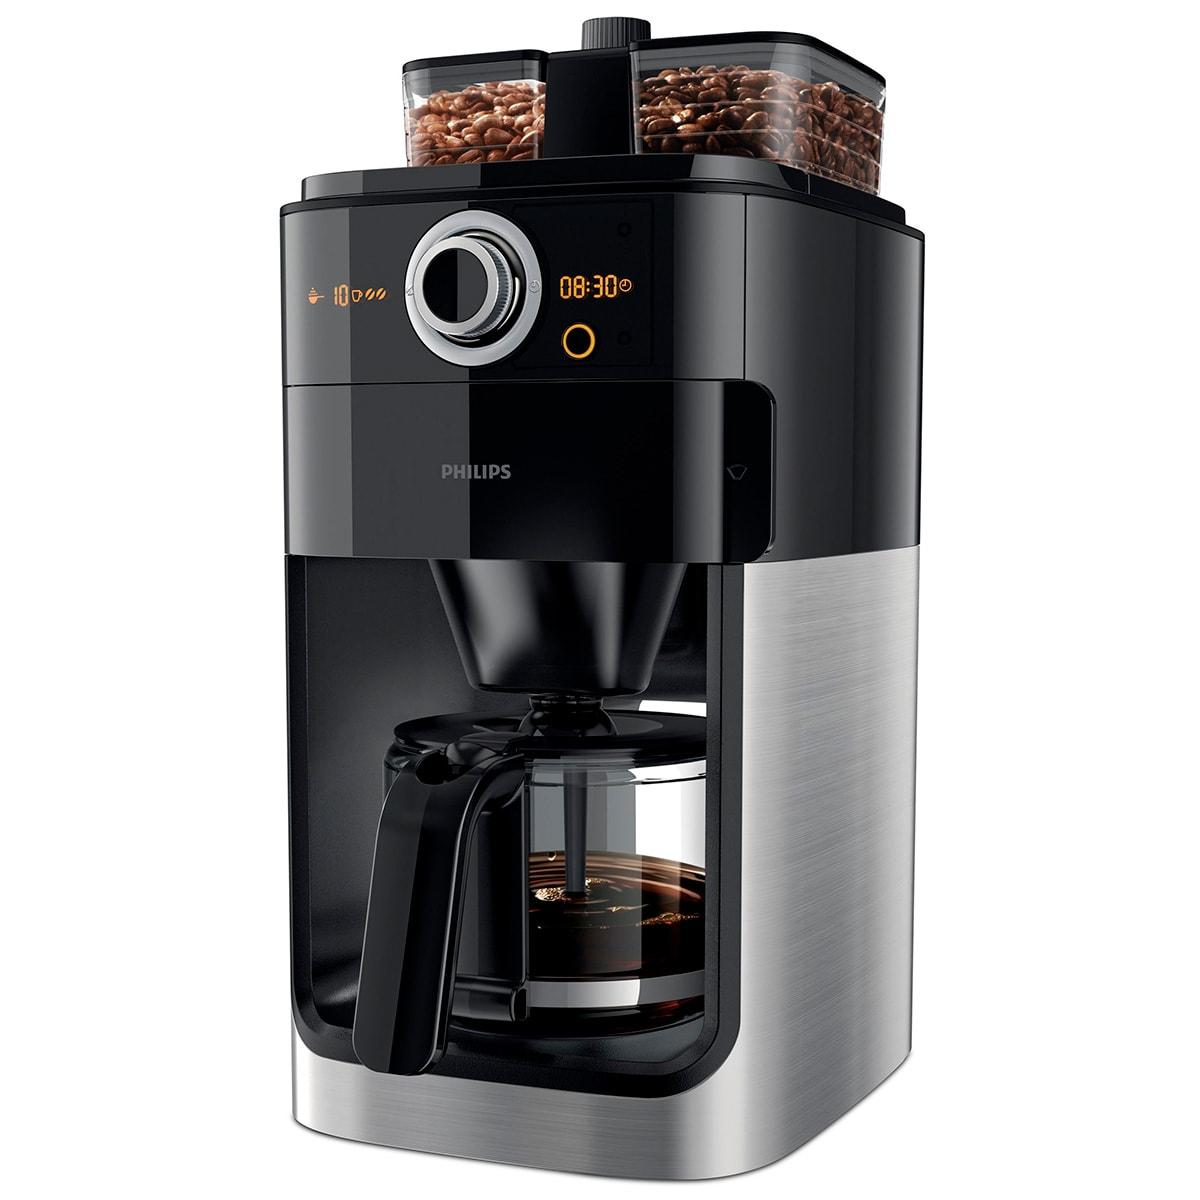 Med integreret kaffekværn og todelt beholder til kaffebønner